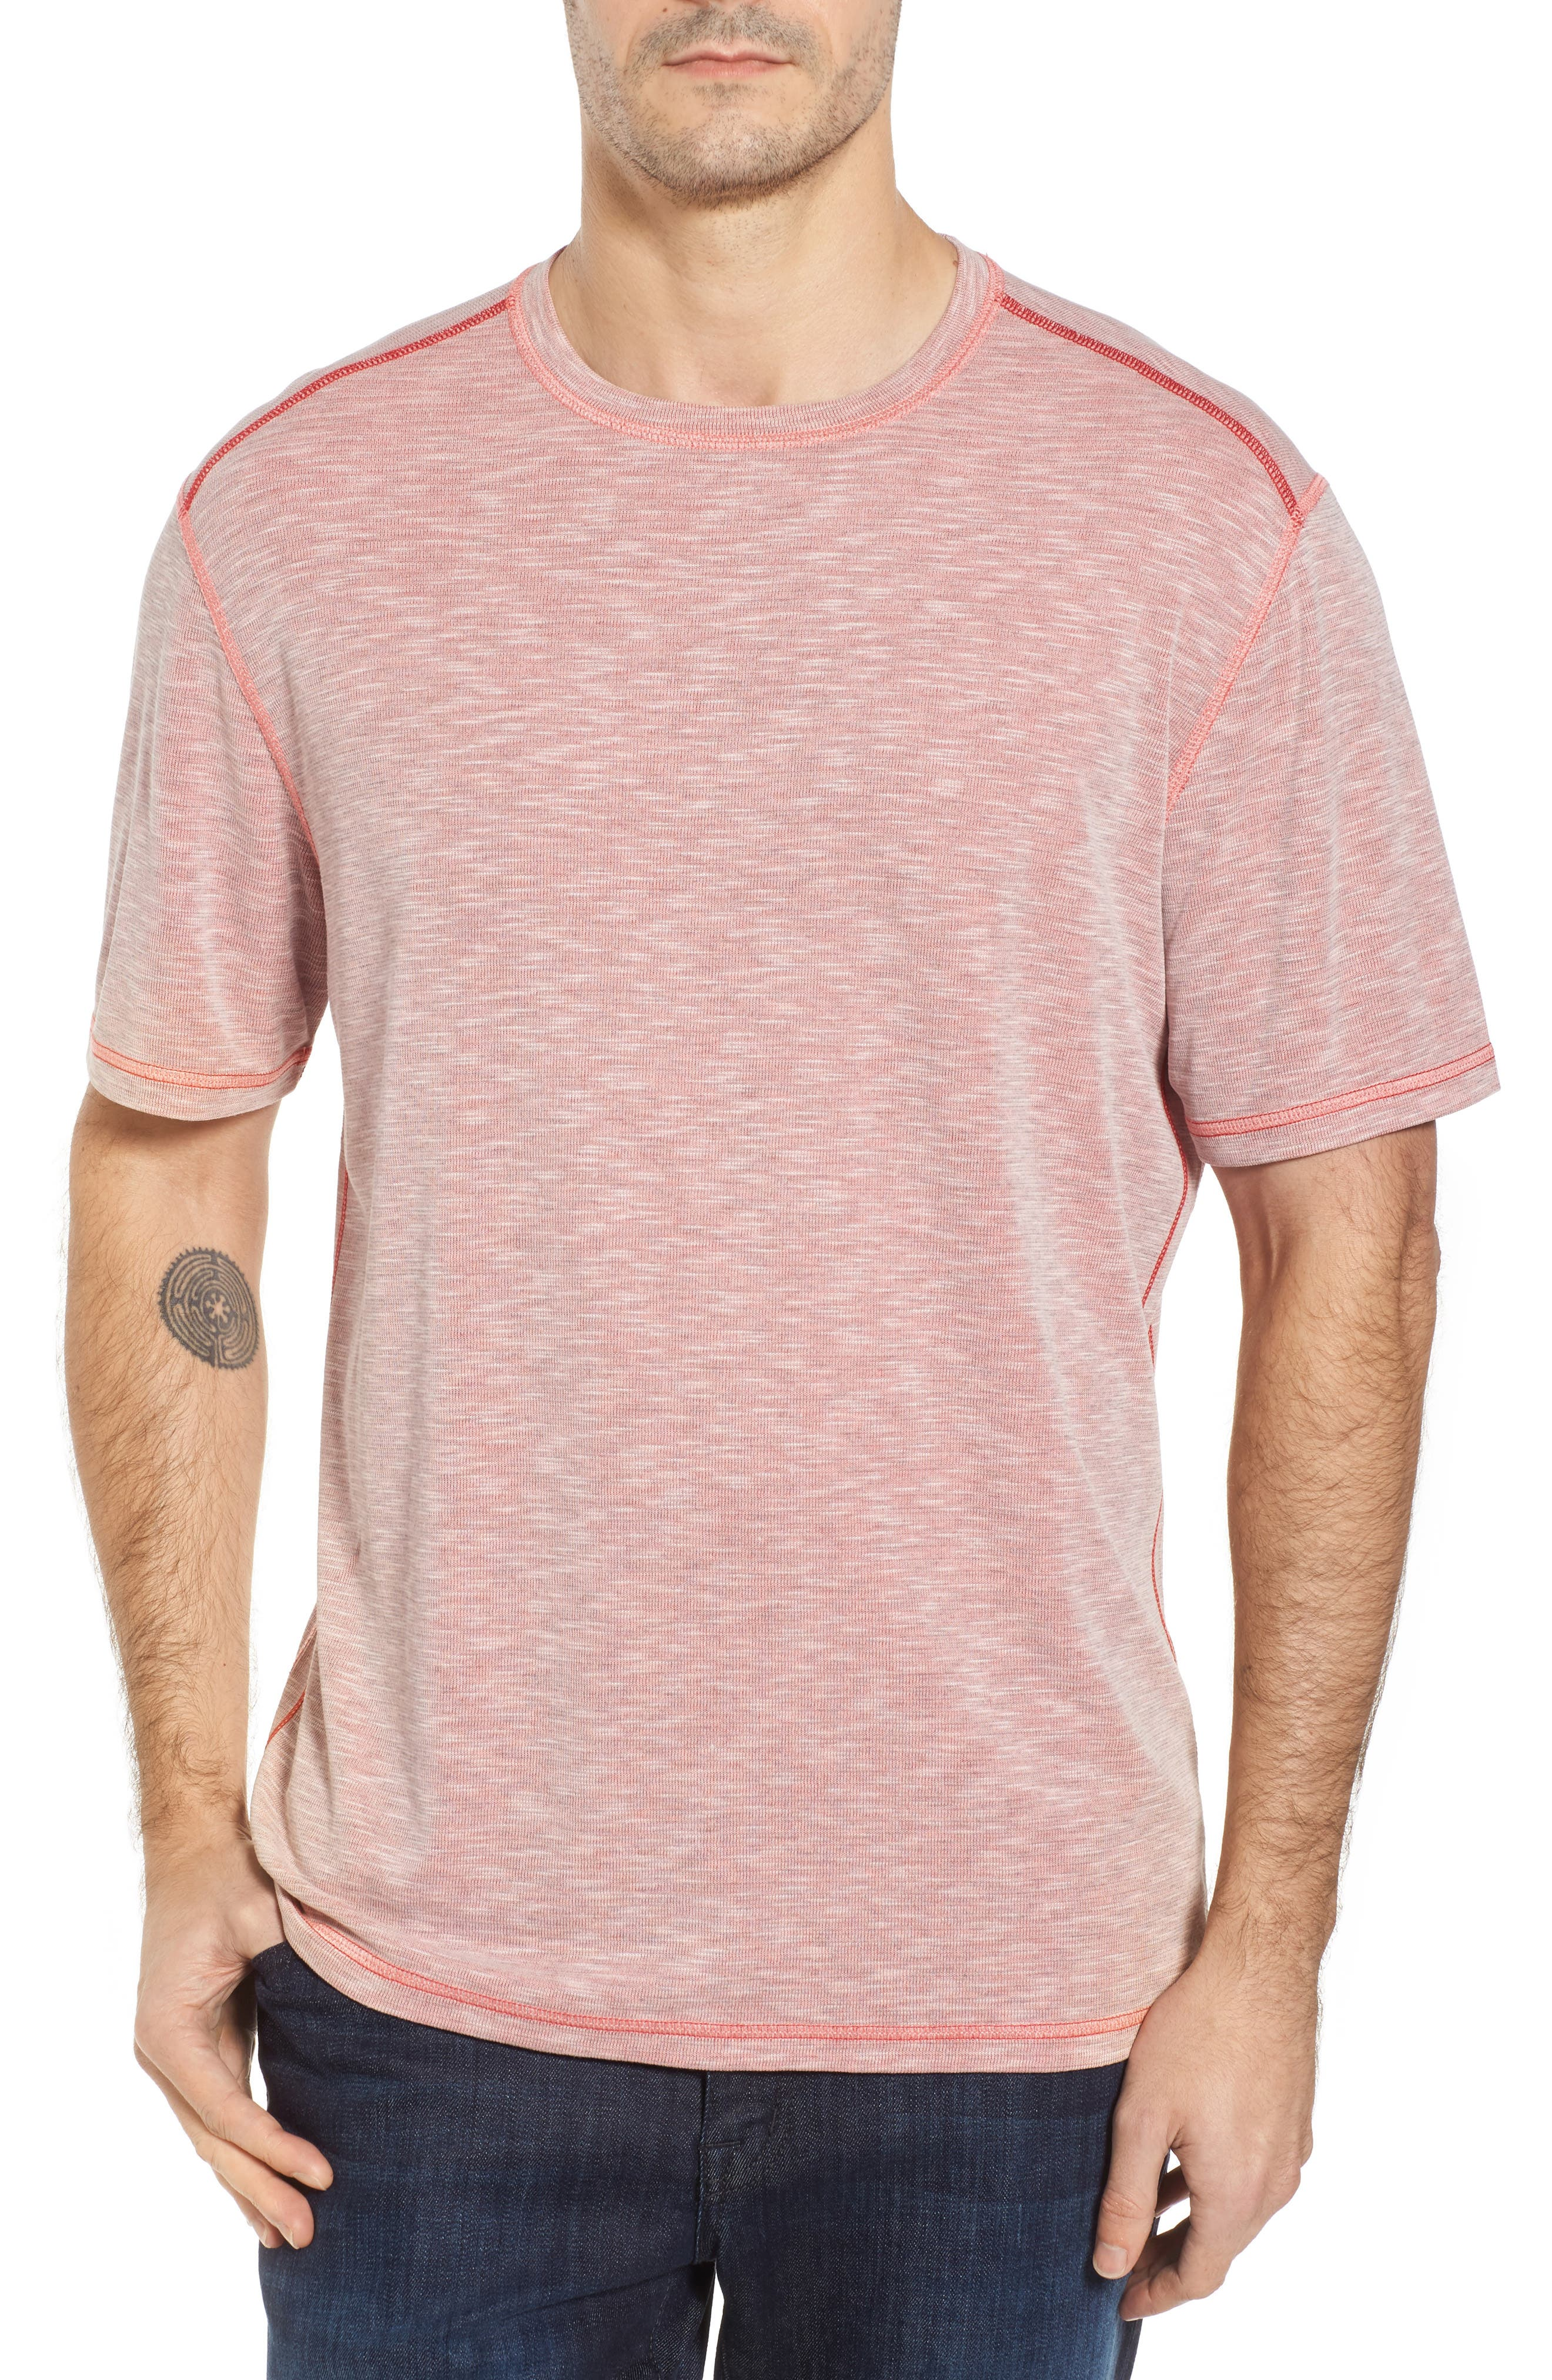 Flip Tide T-Shirt,                         Main,                         color, Red Cherry